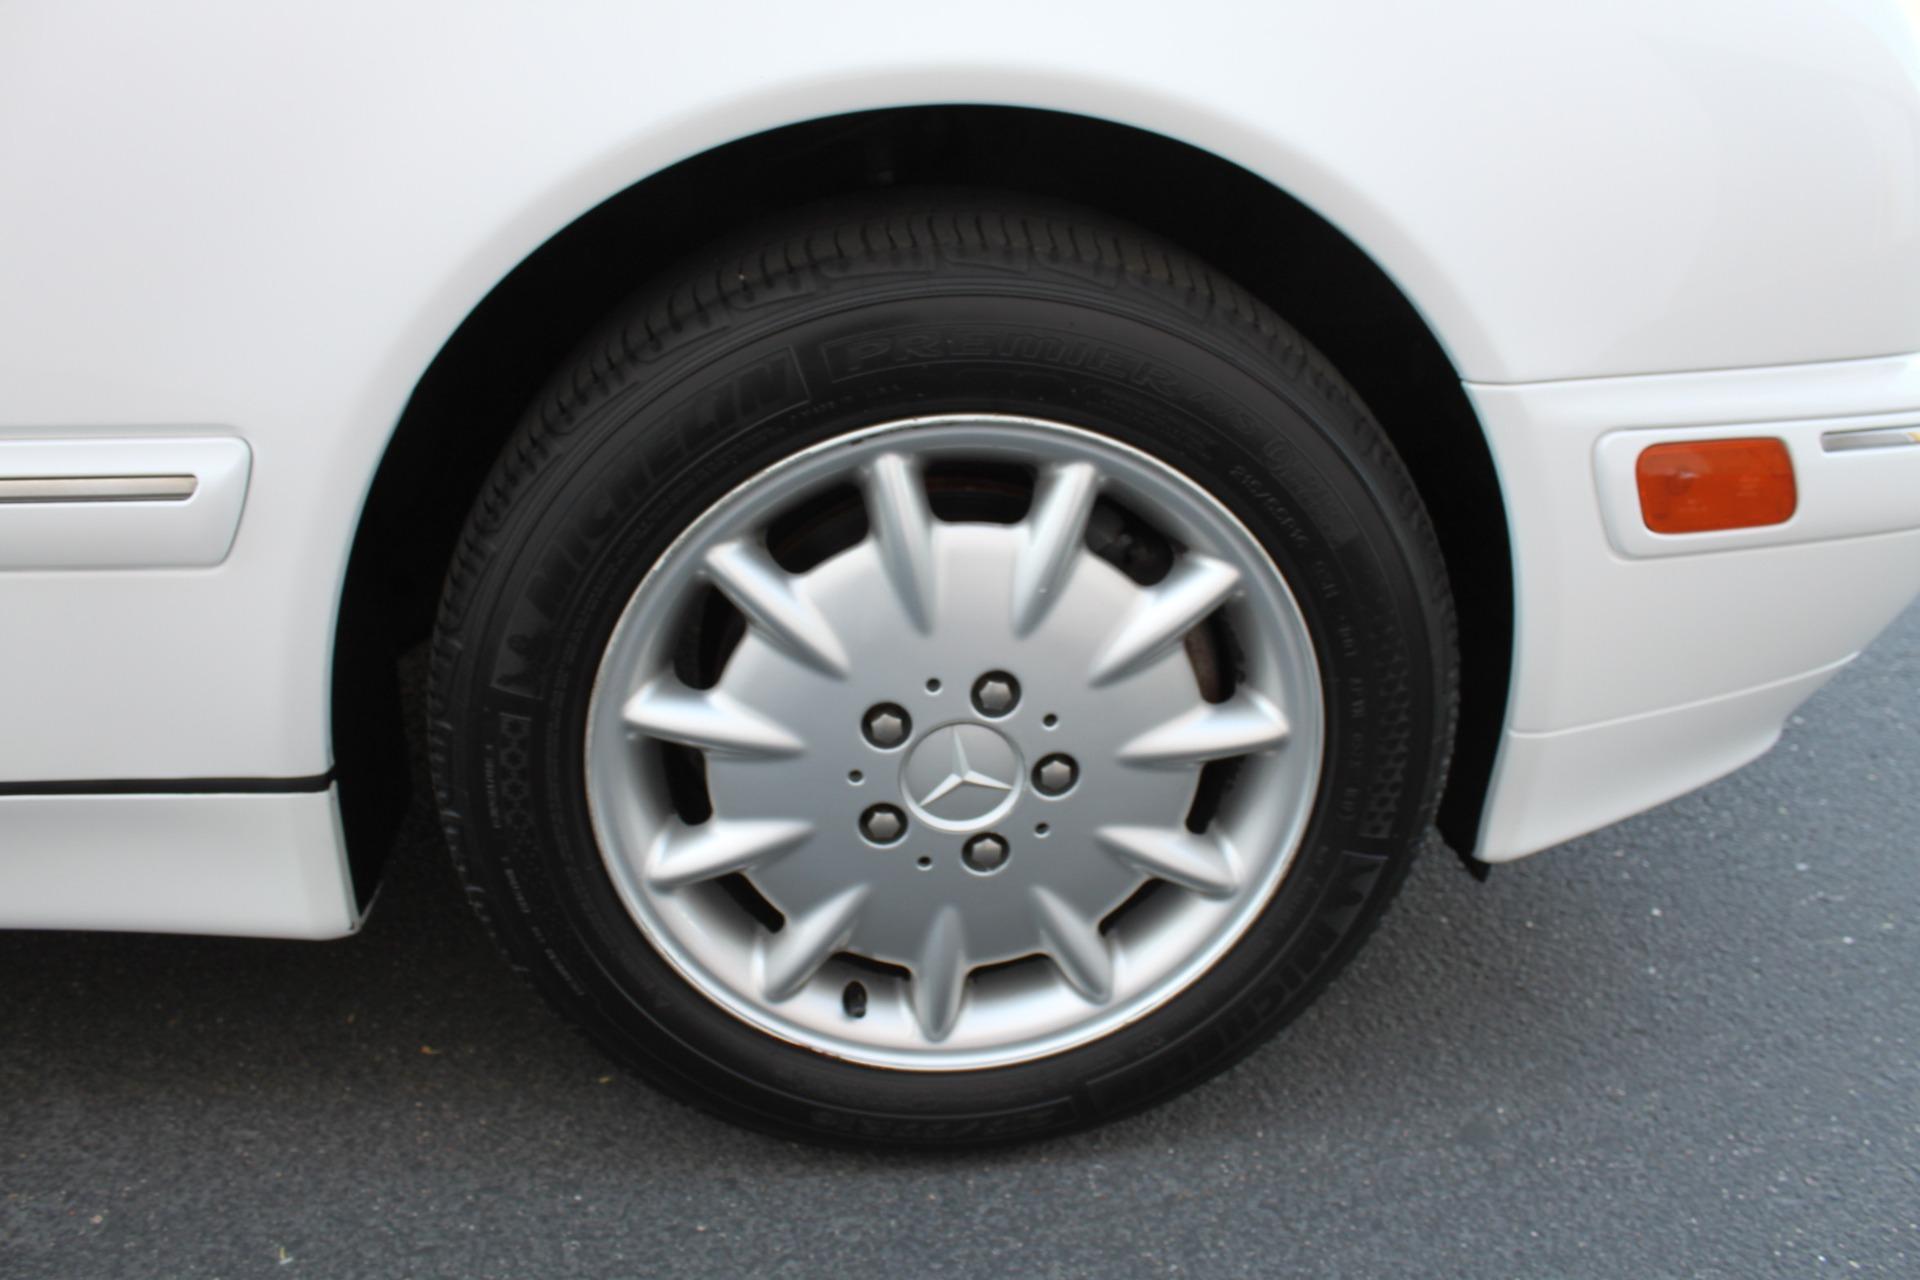 Used-2000-Mercedes-Benz-E-Class-Wagon-Honda